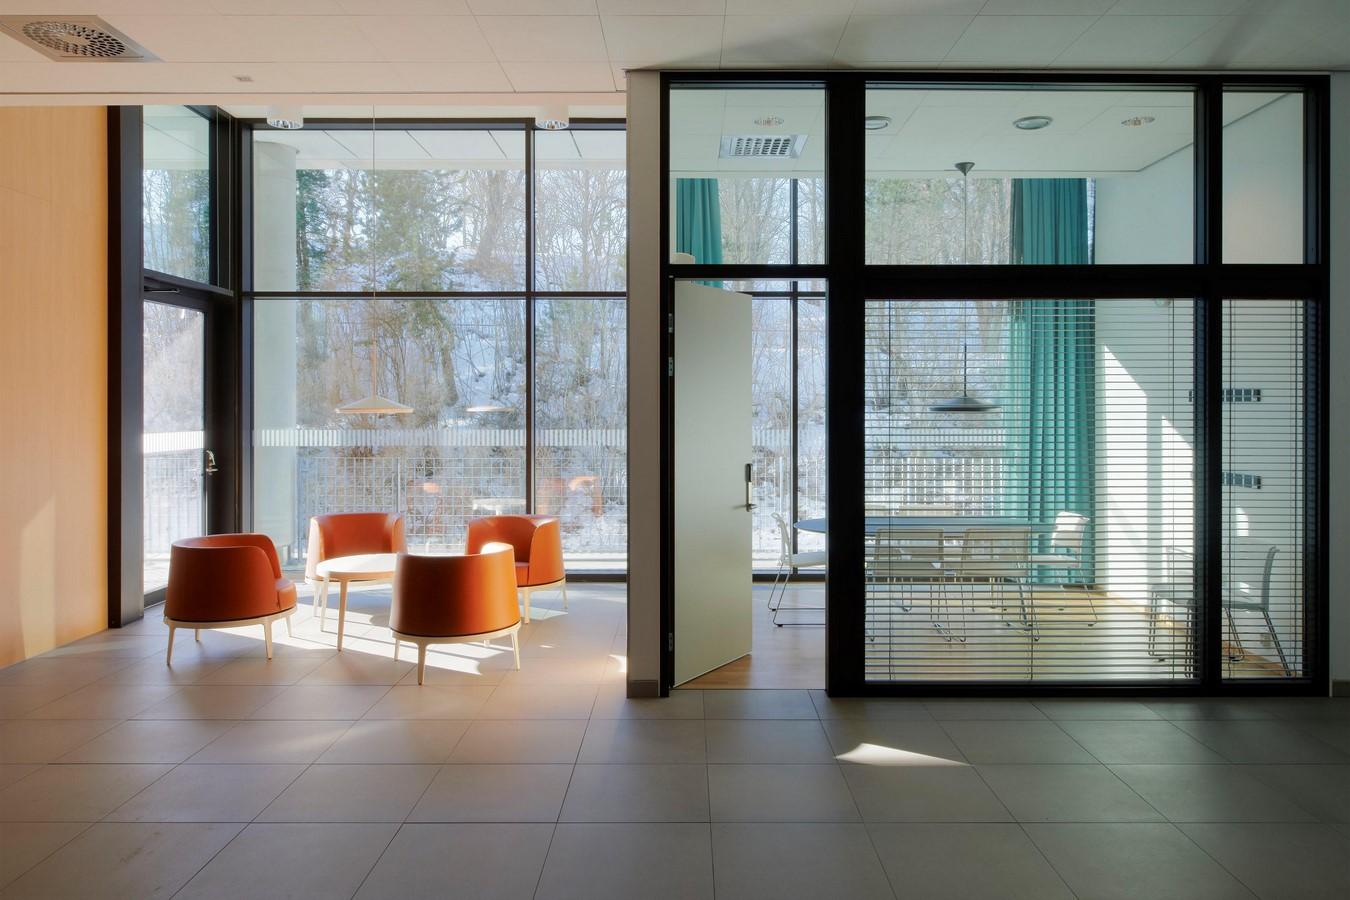 Uppsala University Hospital Psychiatric Building, Sweden - Sheet1